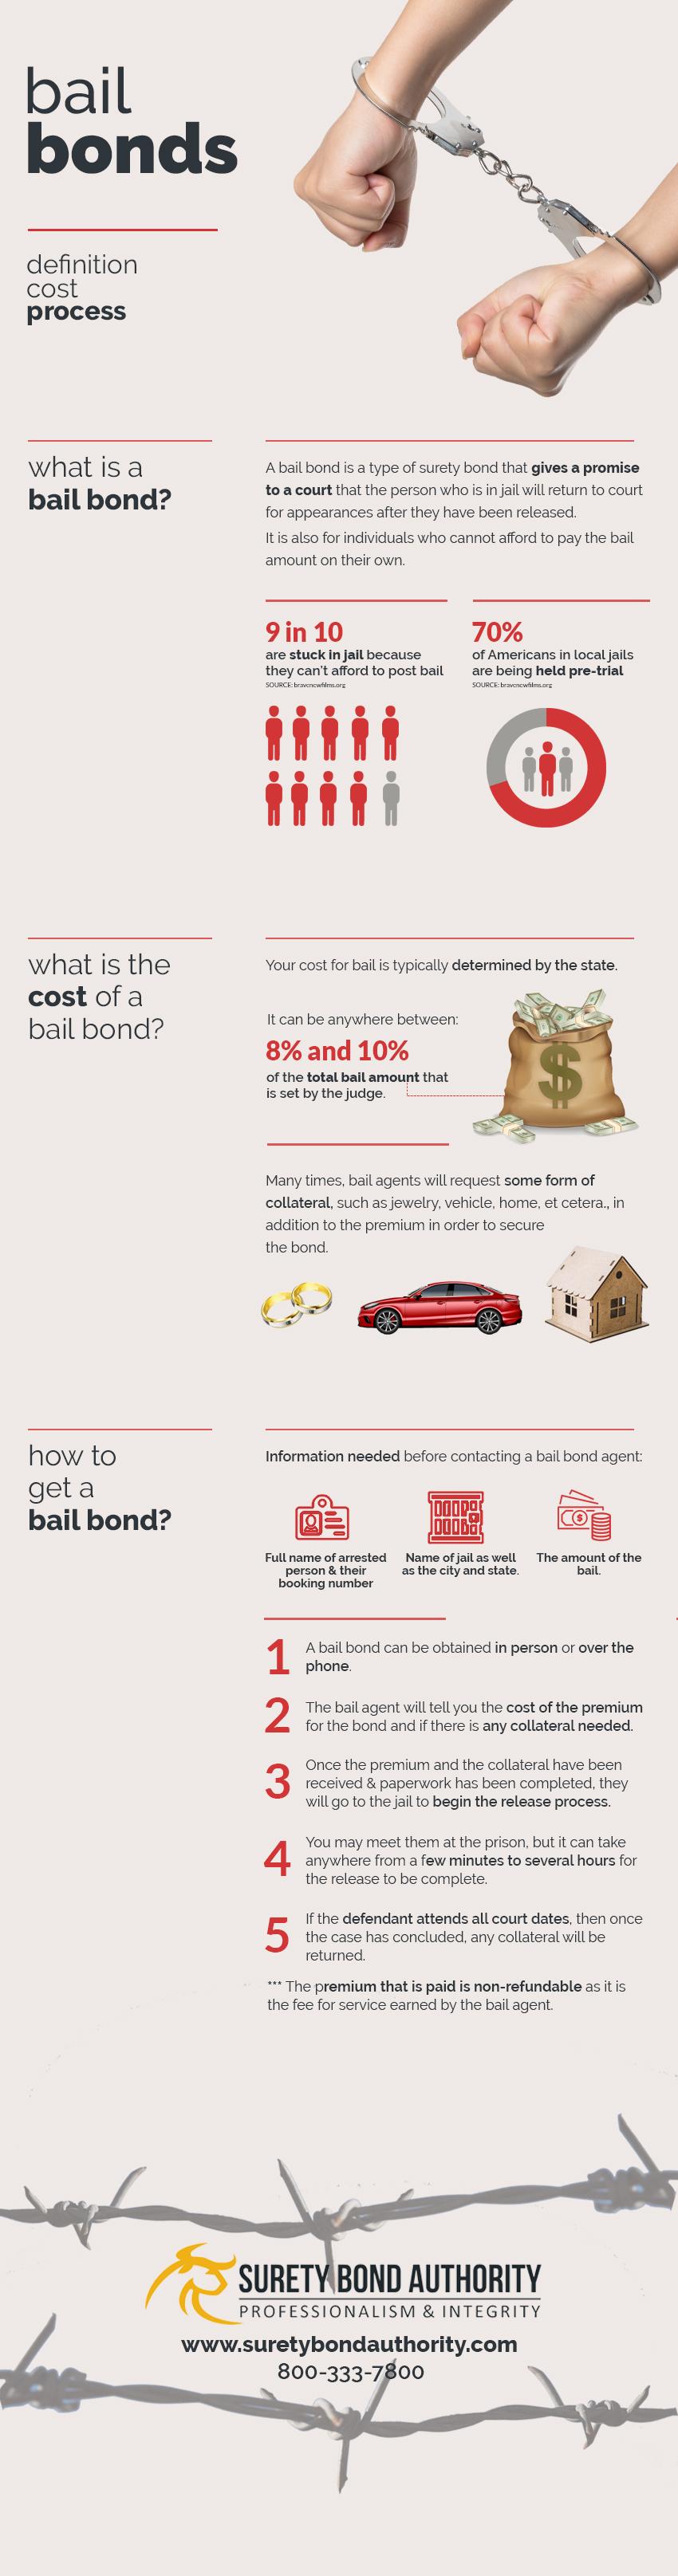 Bail Bonds Infographic